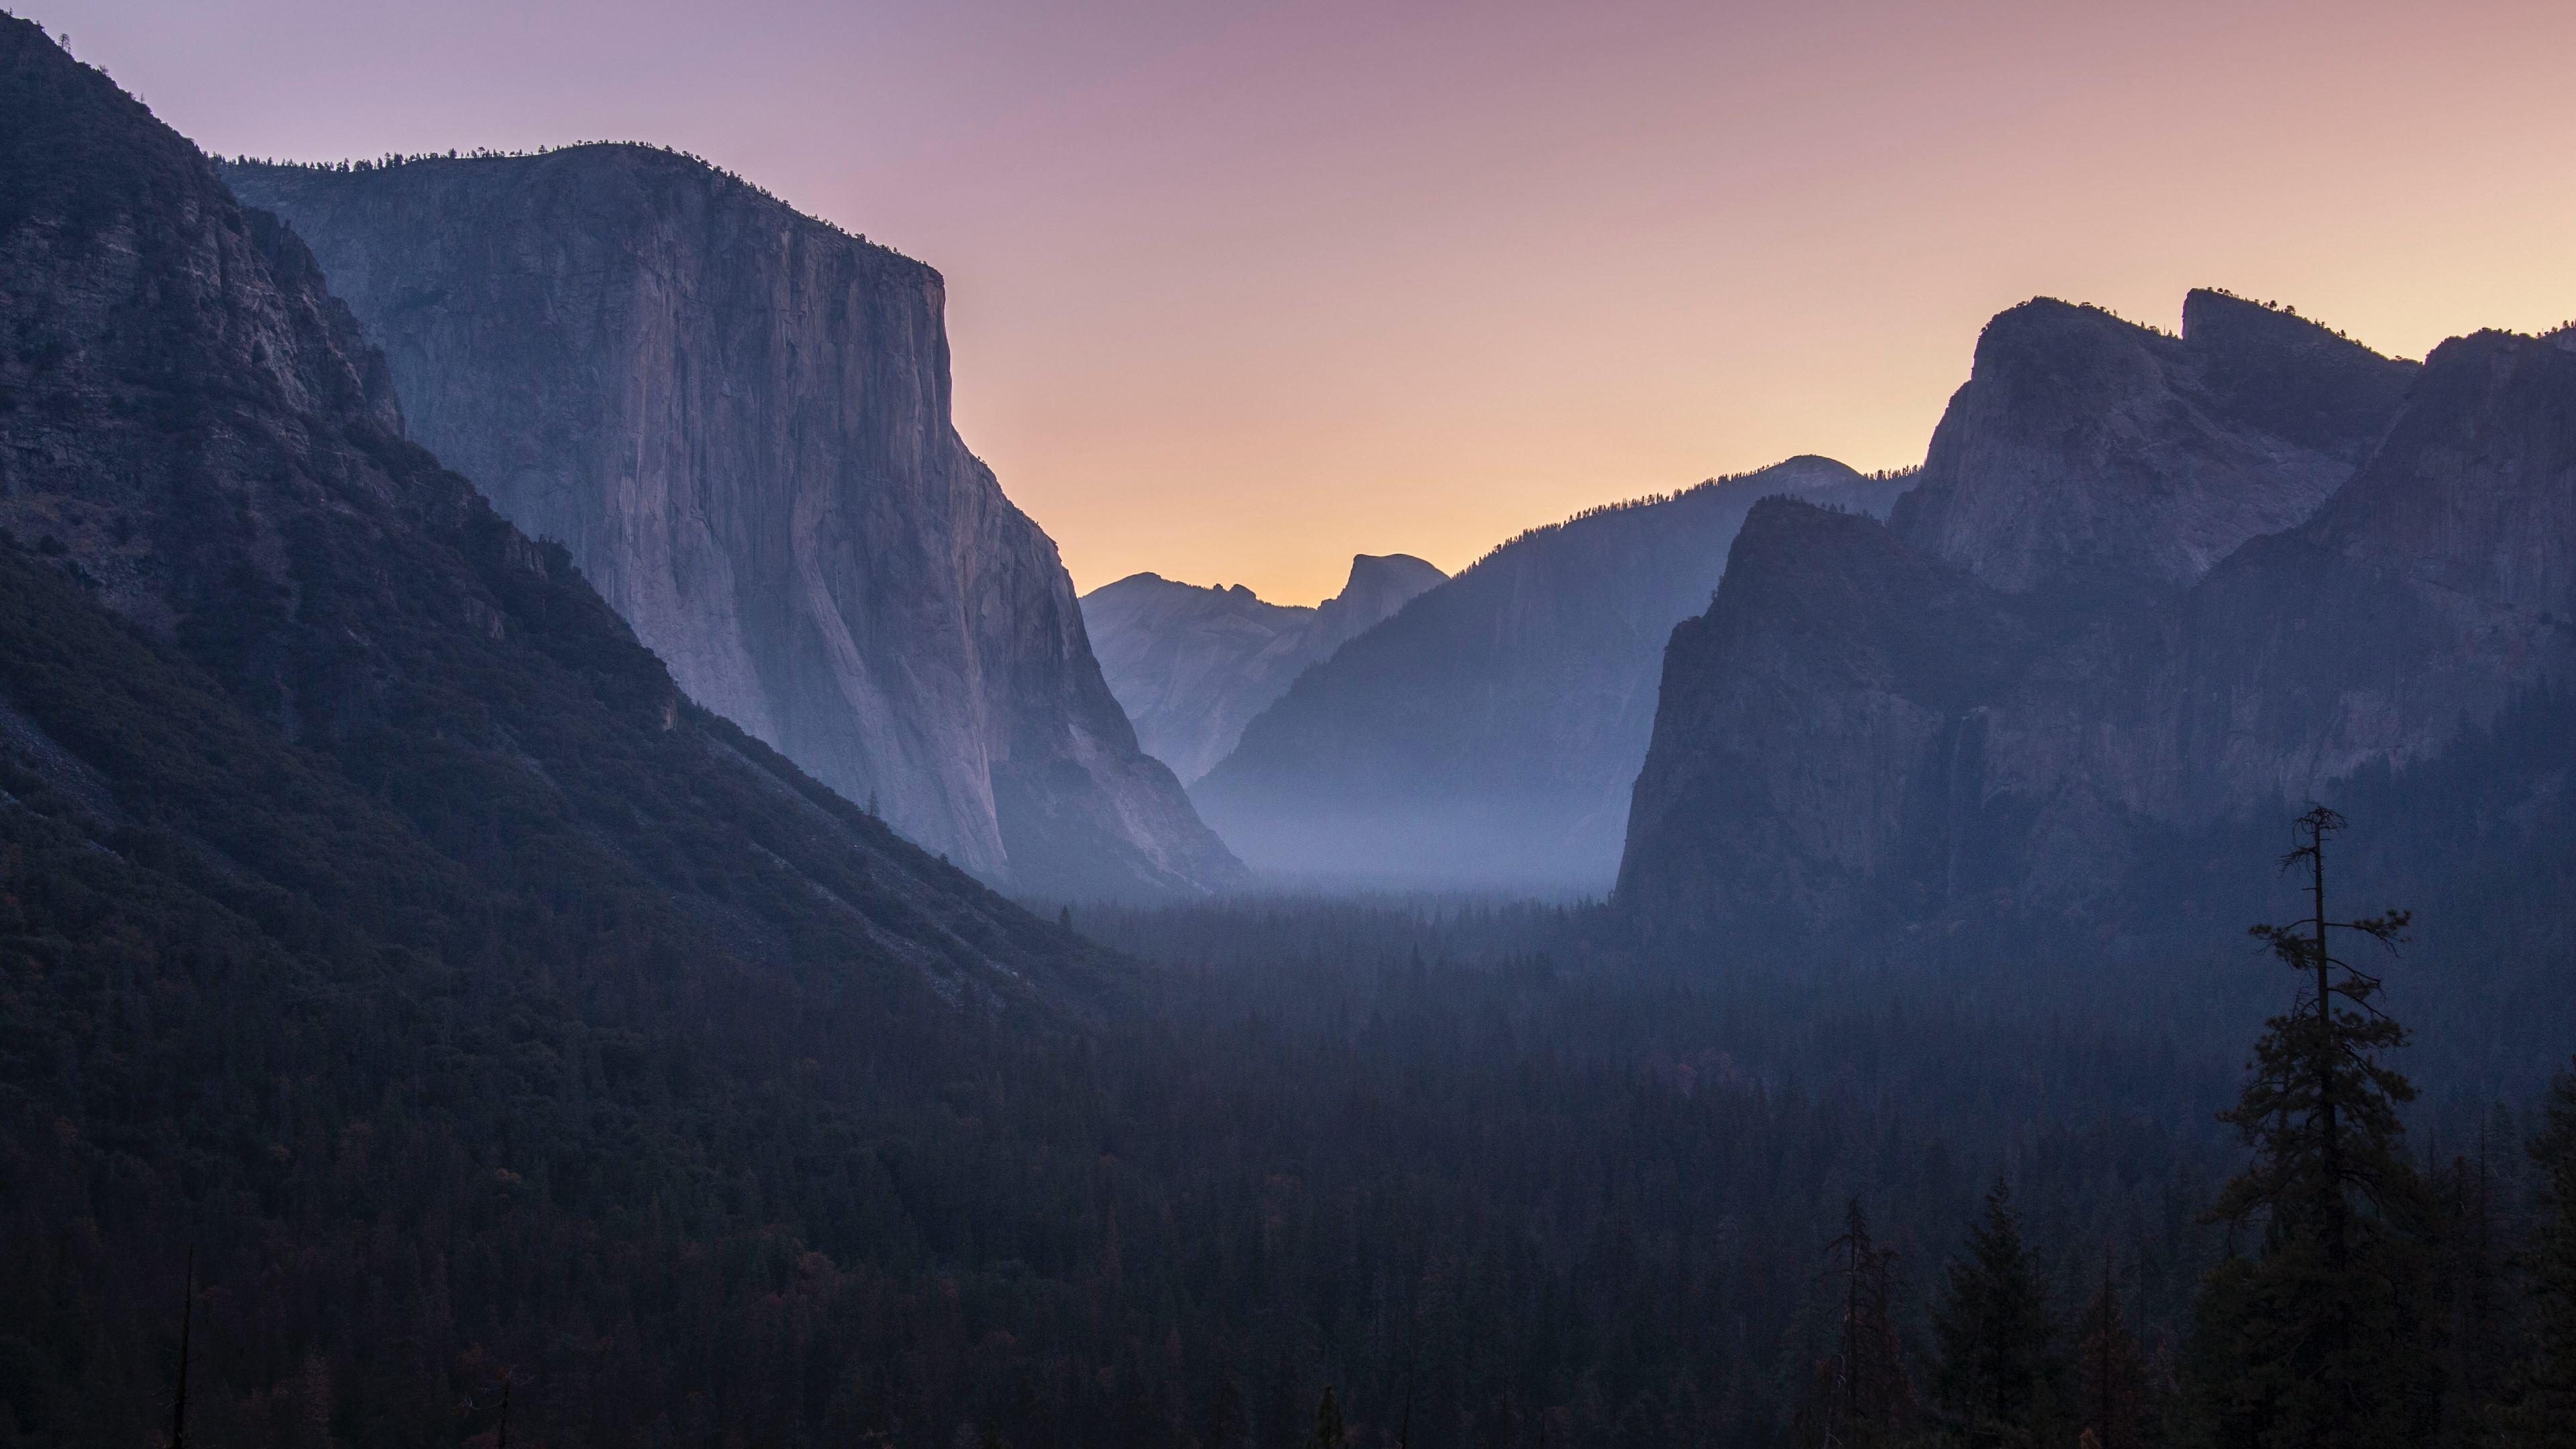 Wallpaper 4k Yosemite National Park 4k 4k Wallpapers 5k